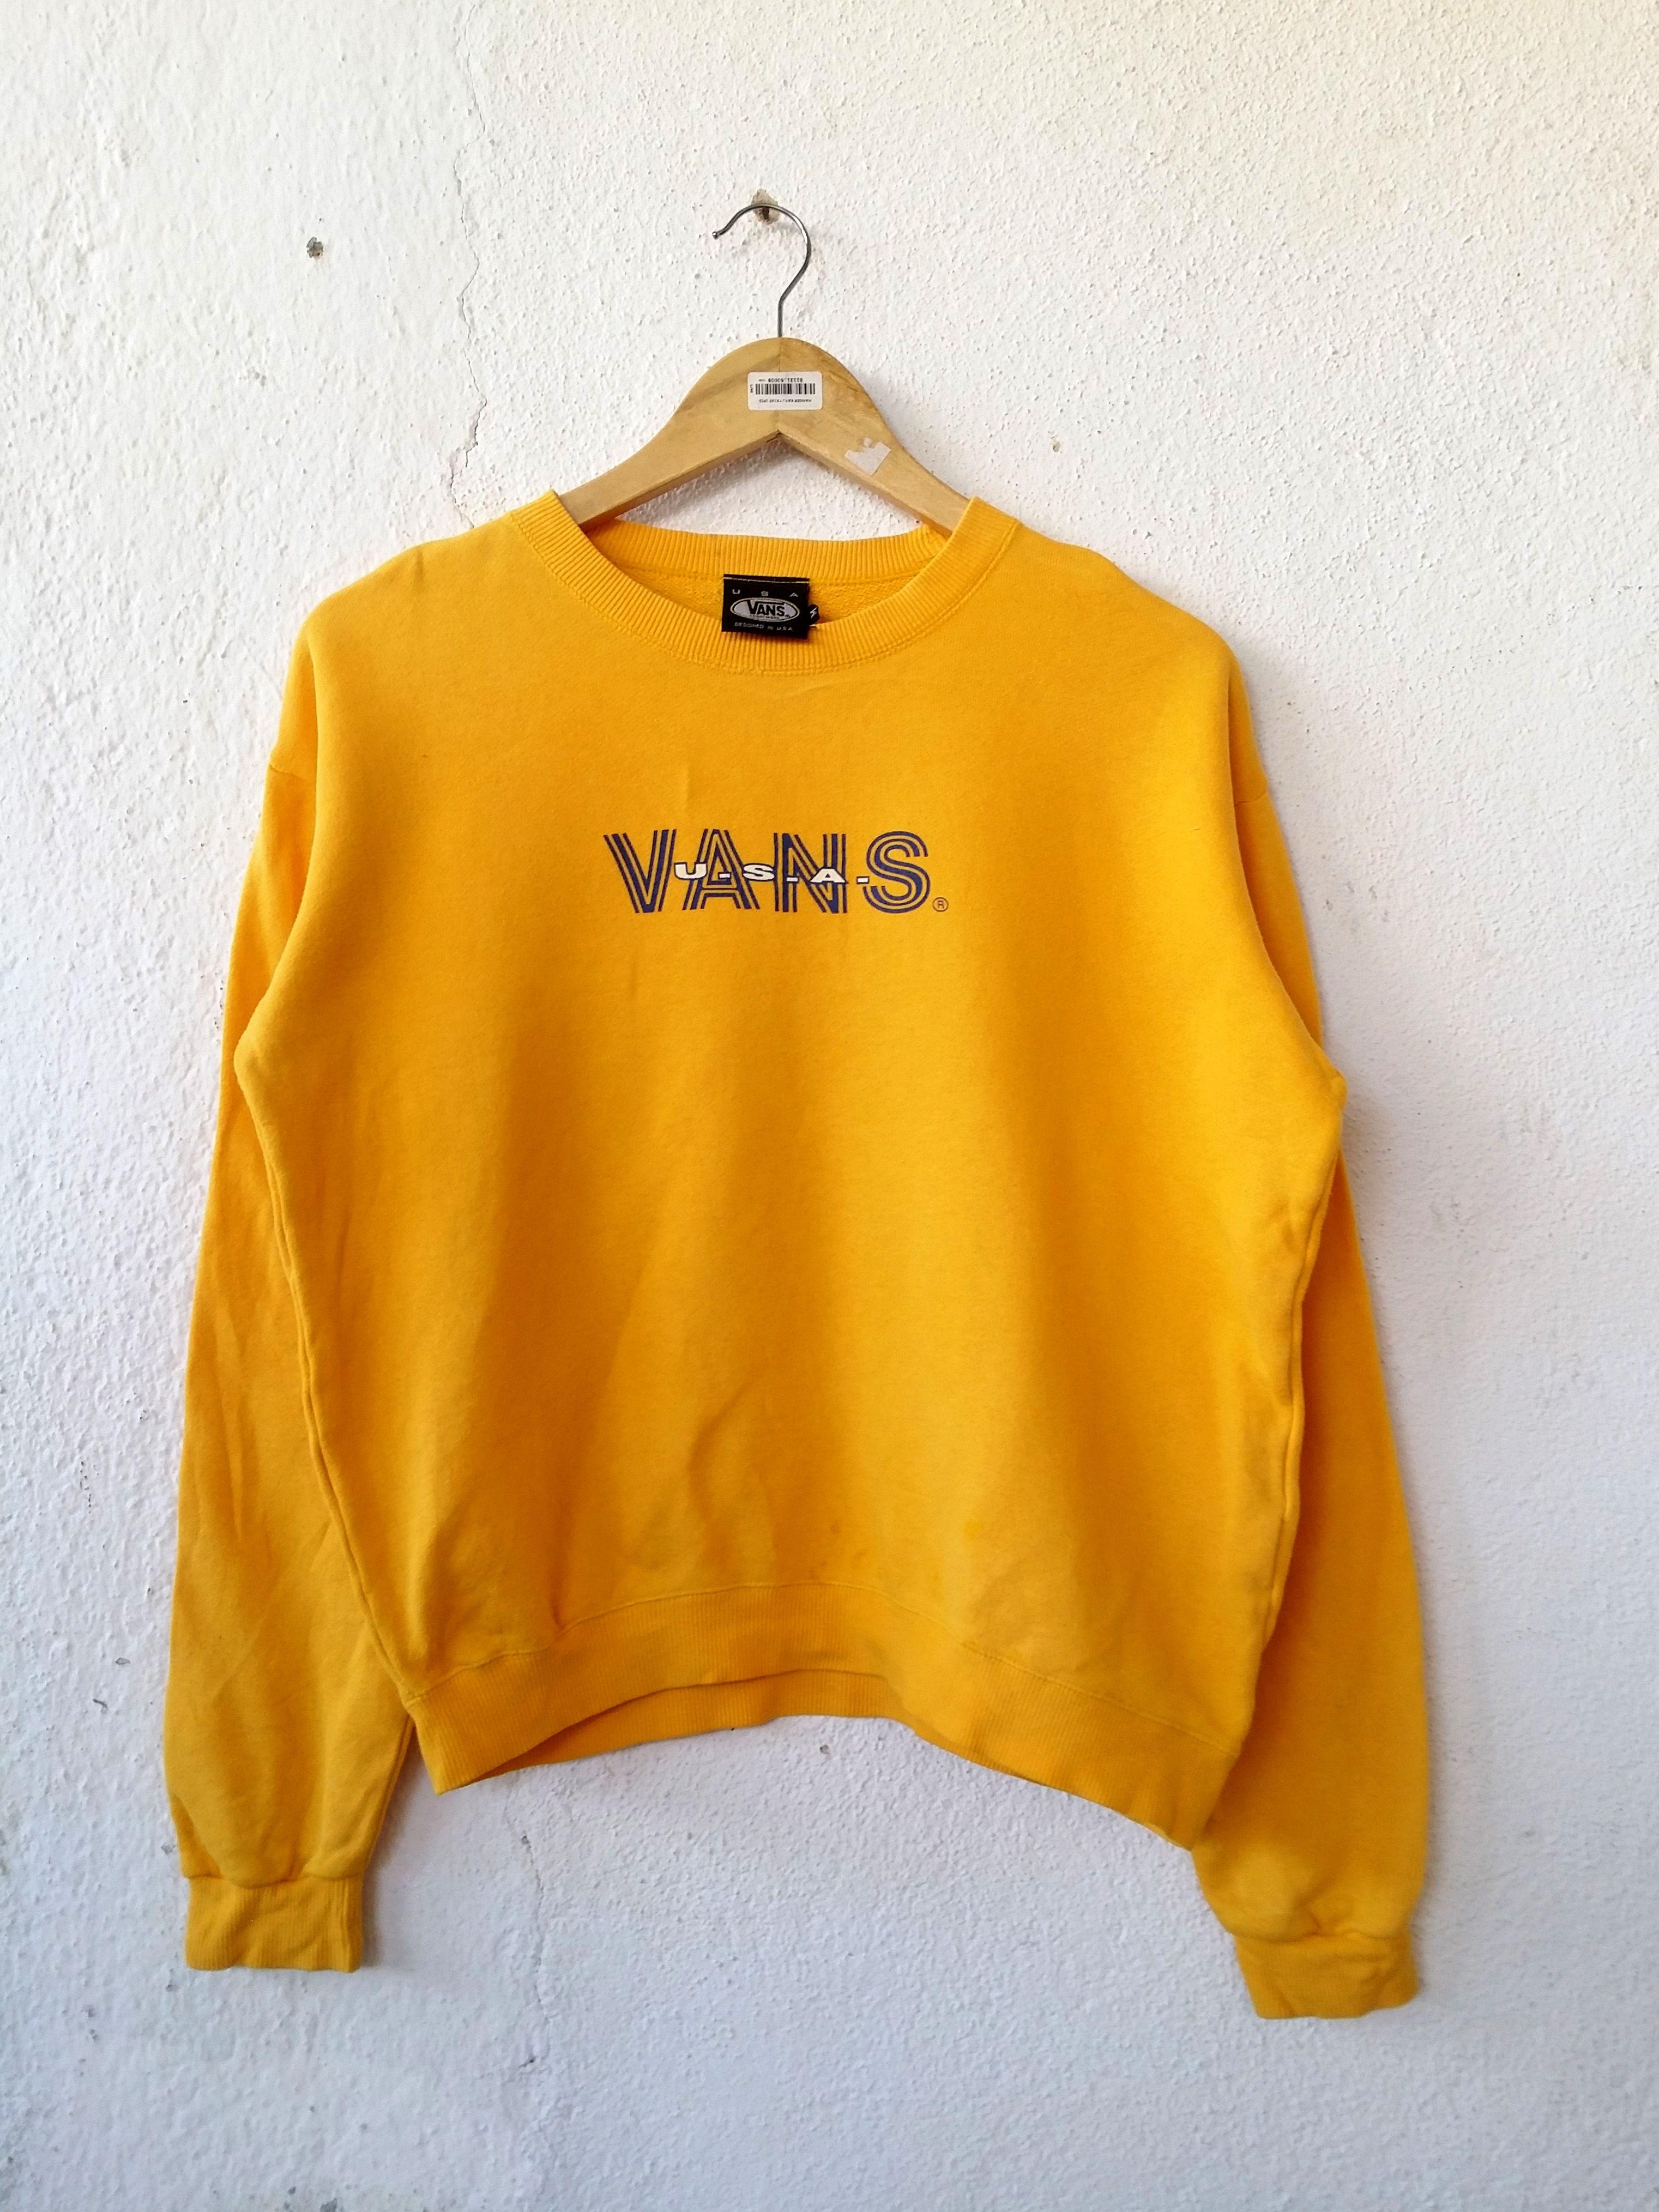 600cc26dfe Vans Sweatshirt Women USA Jumper Pullover Size M